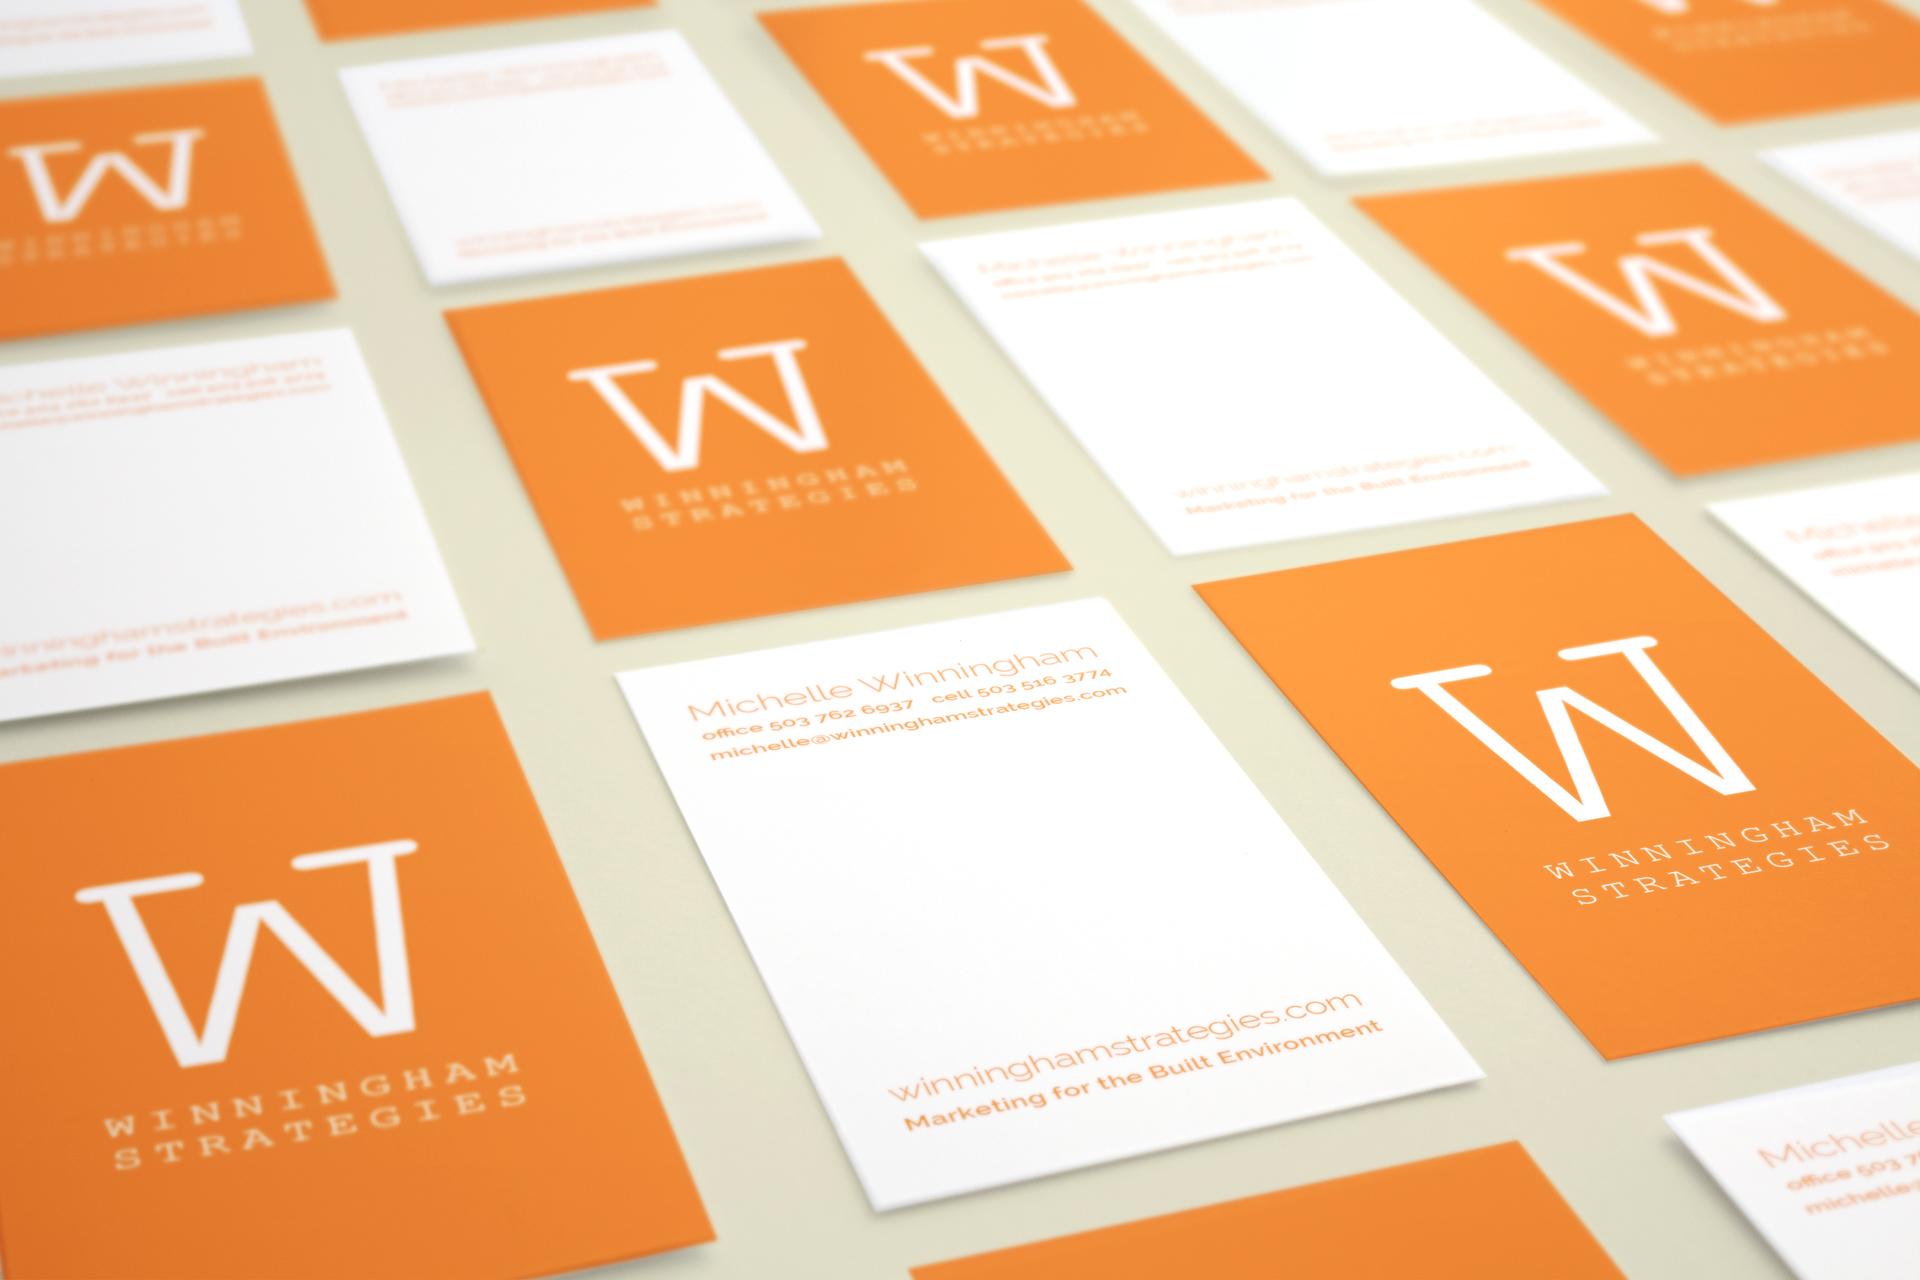 WS_biz-card.jpg